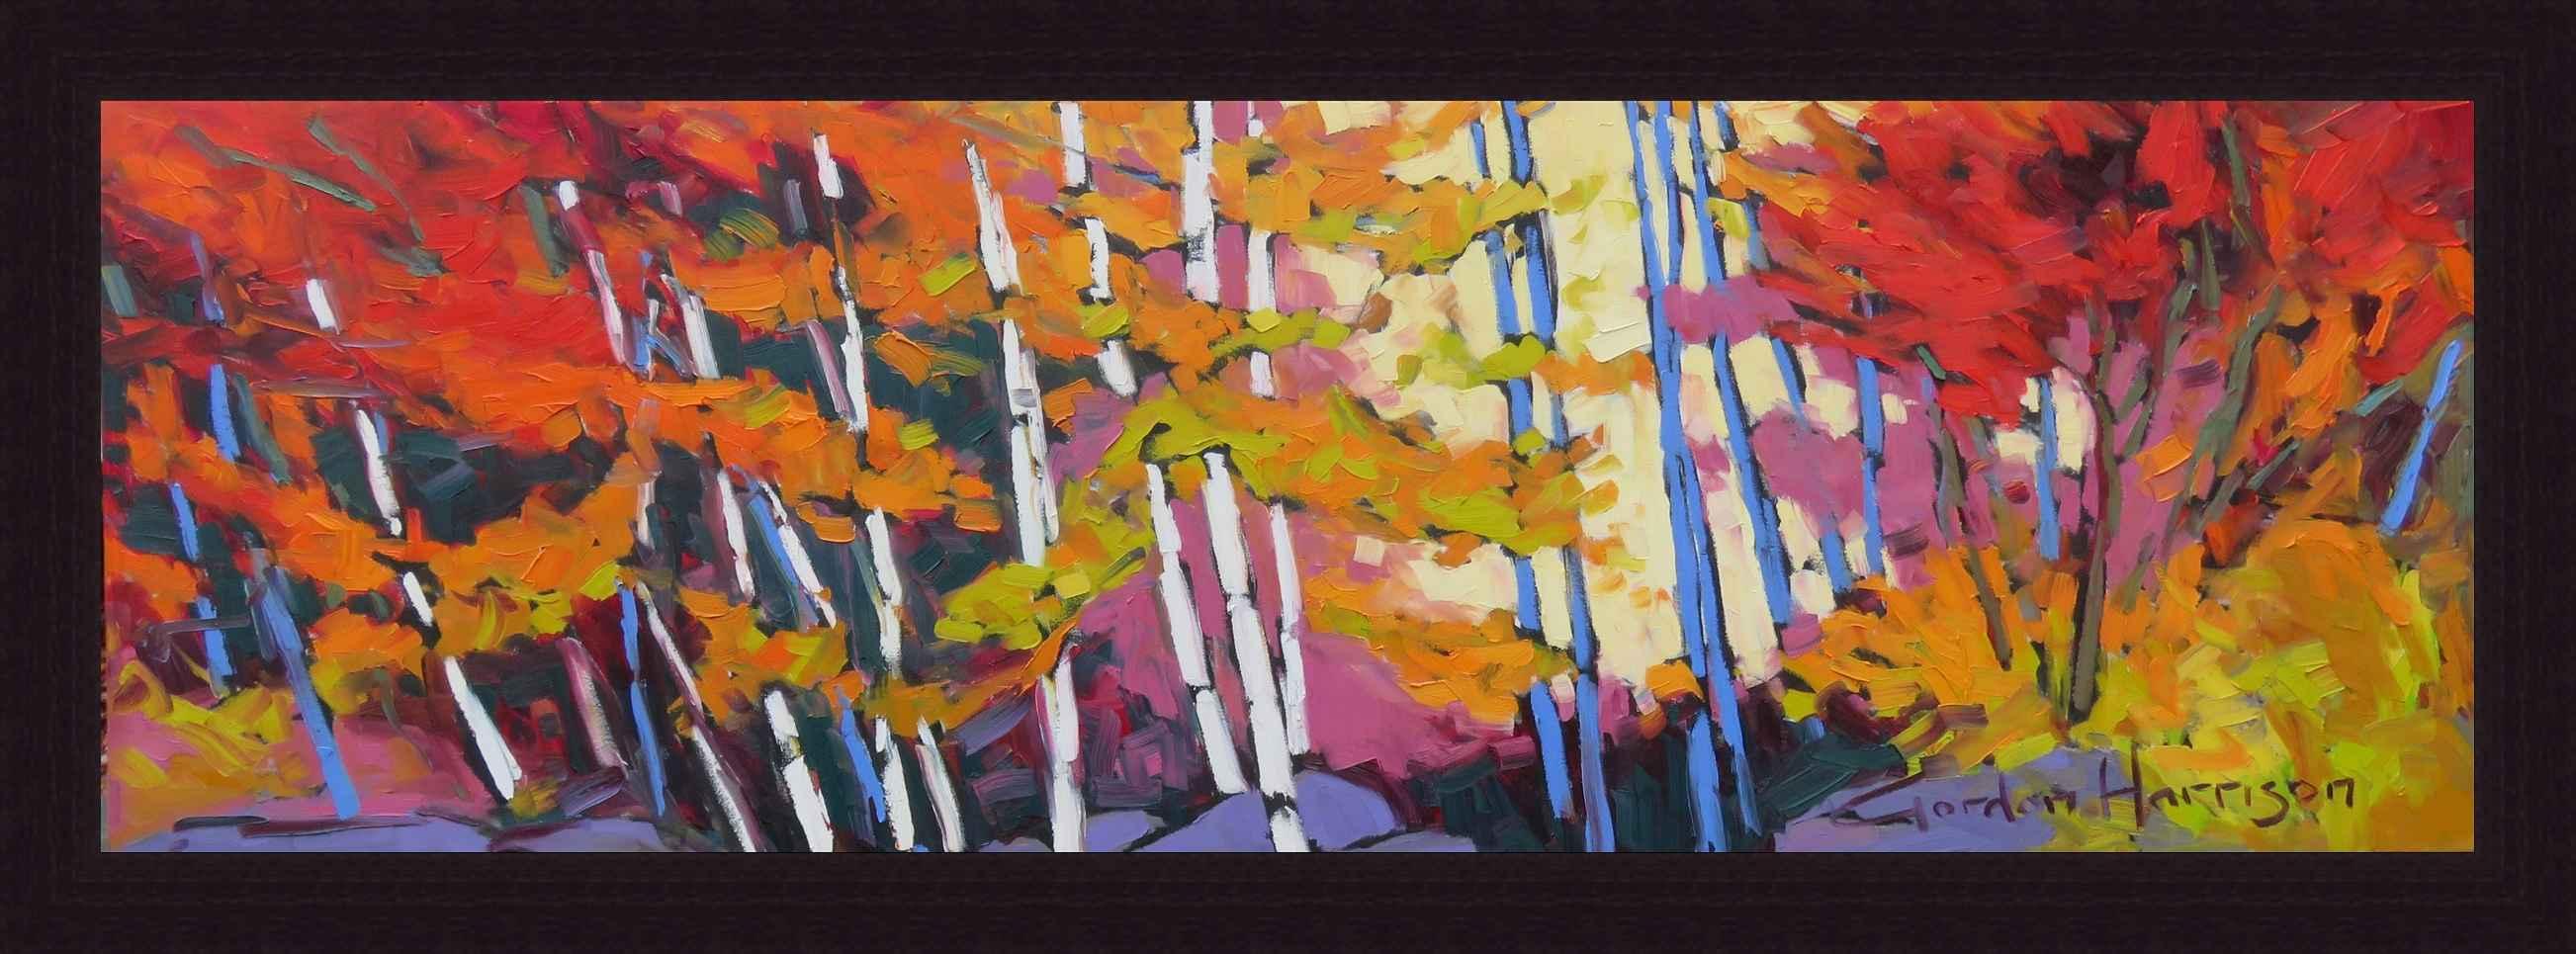 Autumn Expressions, L... by  Gordon Harrison - Masterpiece Online